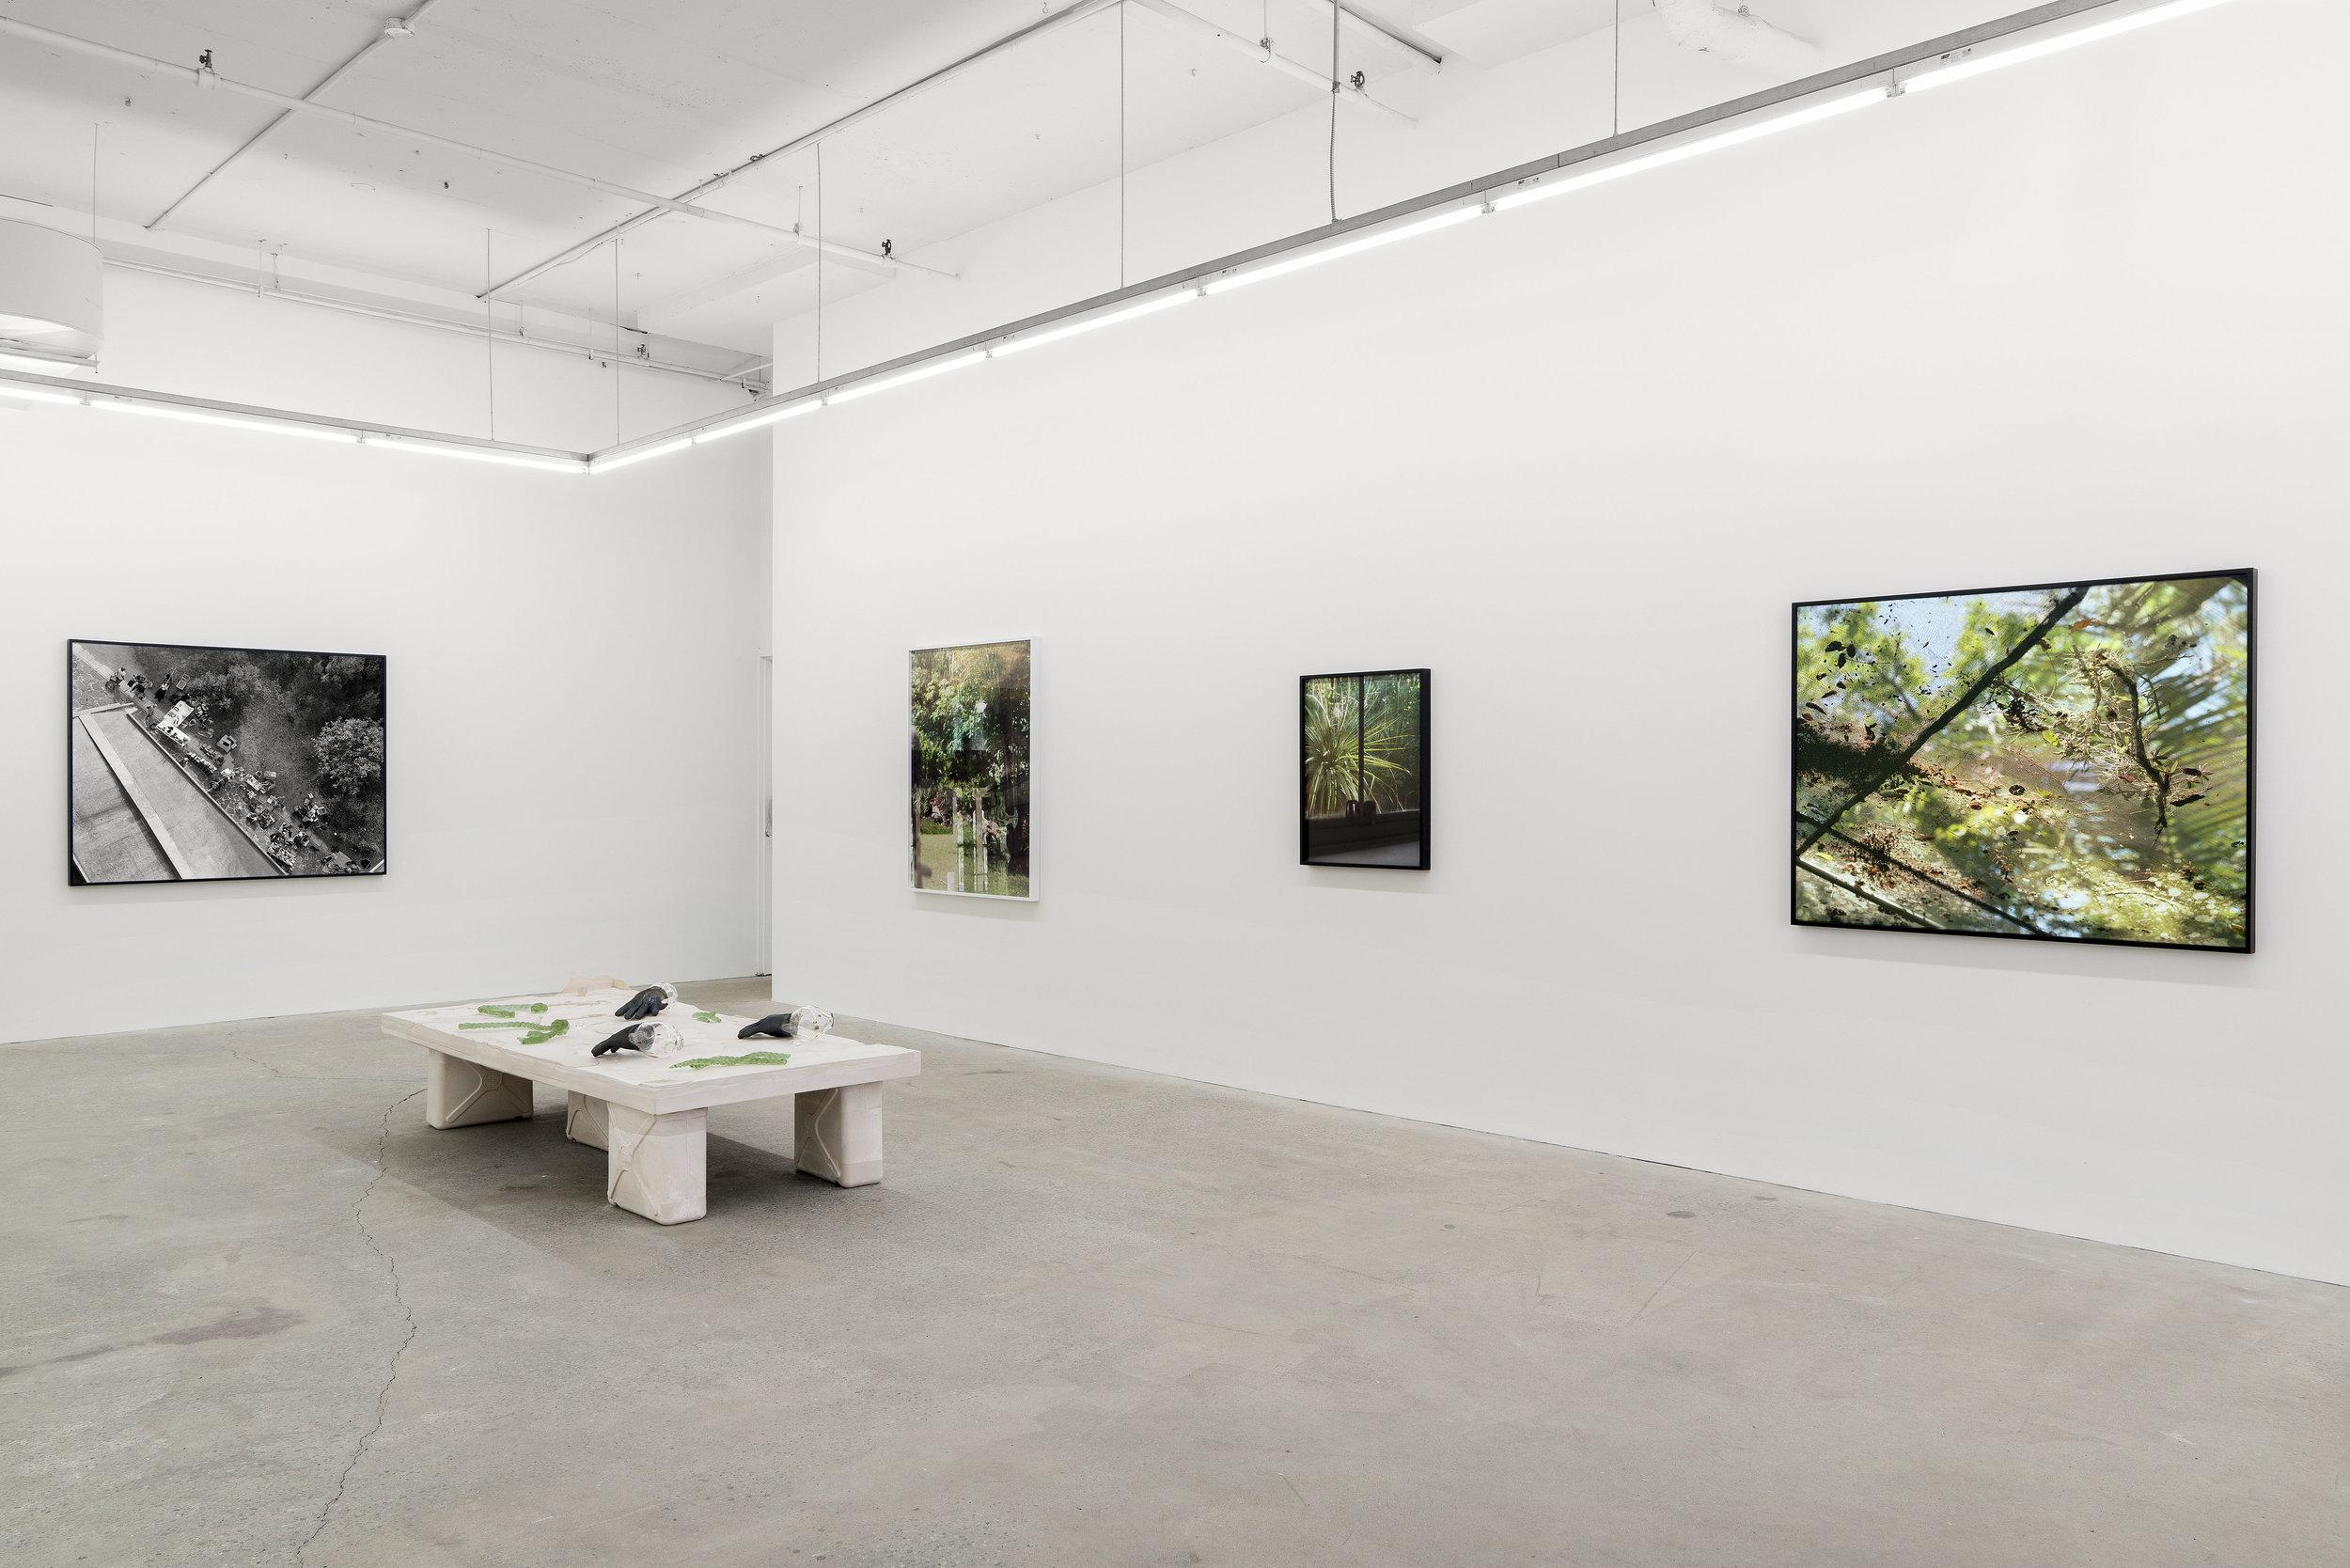 GalerieNicolasRobertLornaBauerHiRes (1 of 32).jpg